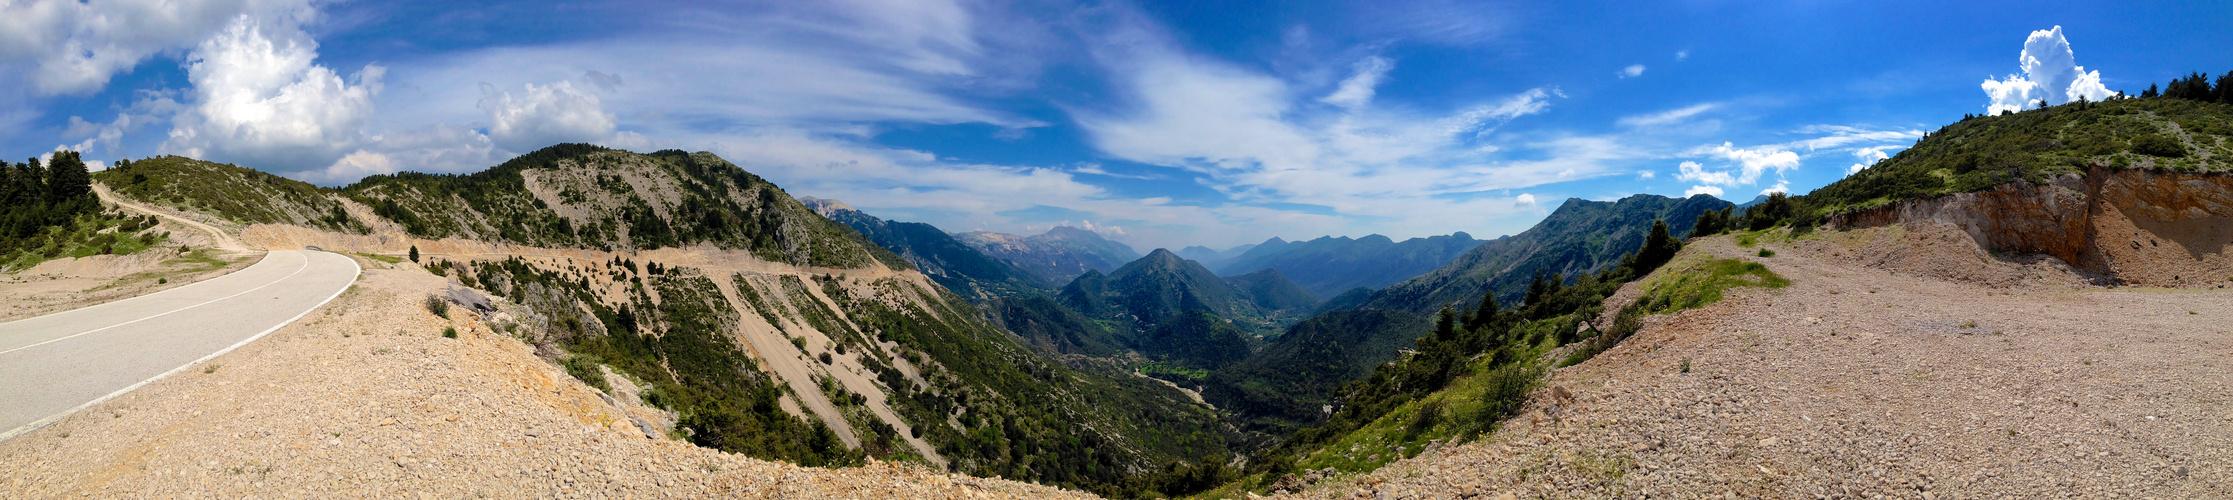 Olitska mountains